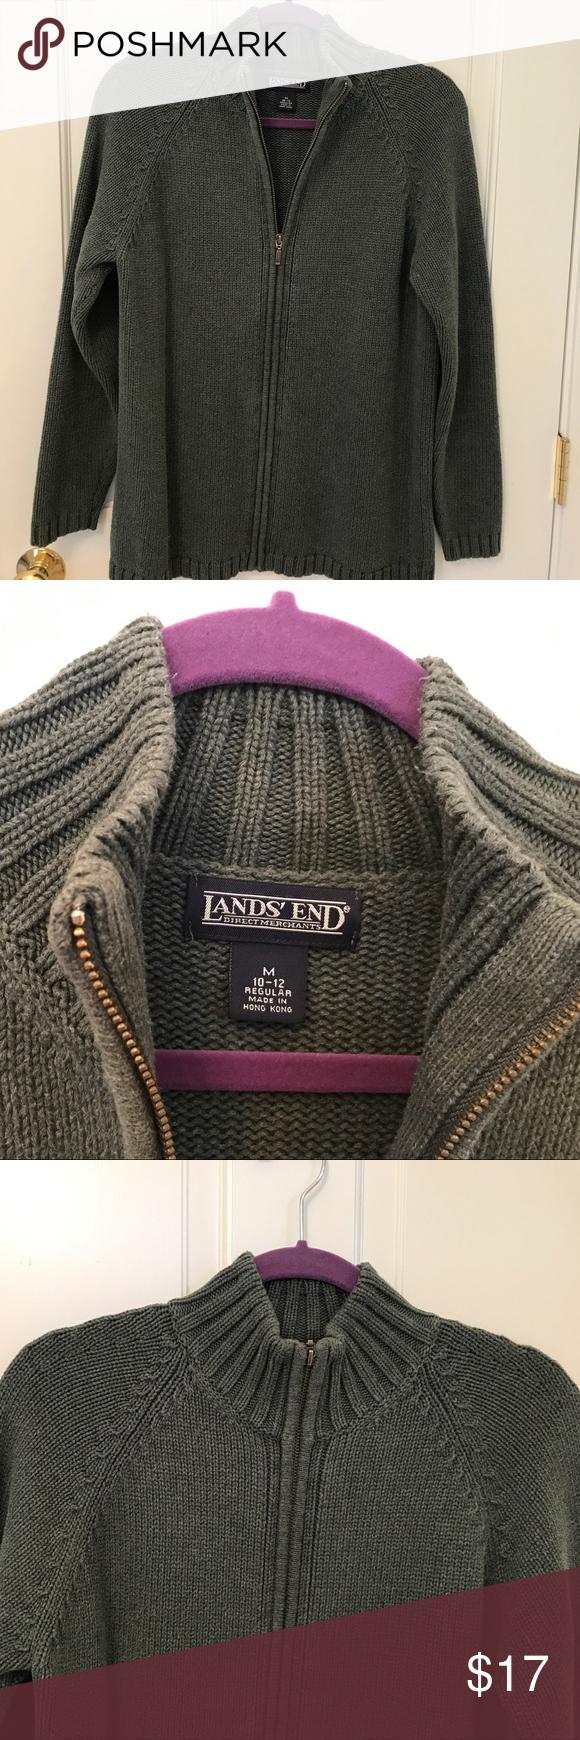 LANDS END Cotton Zip Drifter Cardigan Sweater M | Cotton ...